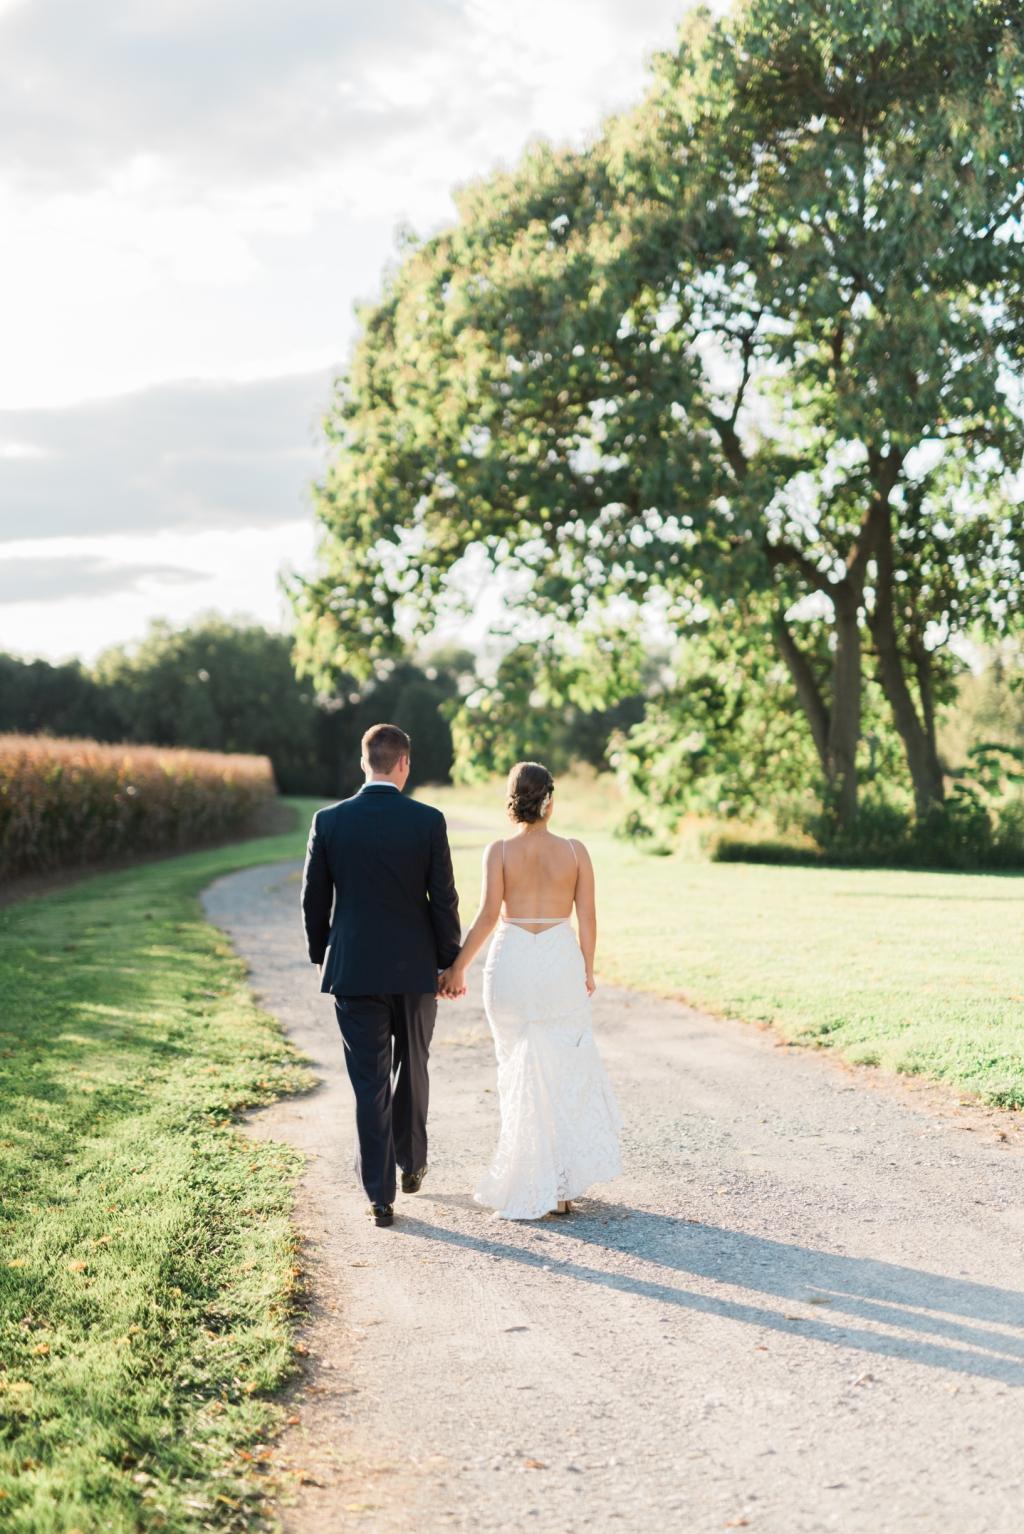 haley-richter-photography-buena-vista-confrence-center-wedding-summer-148